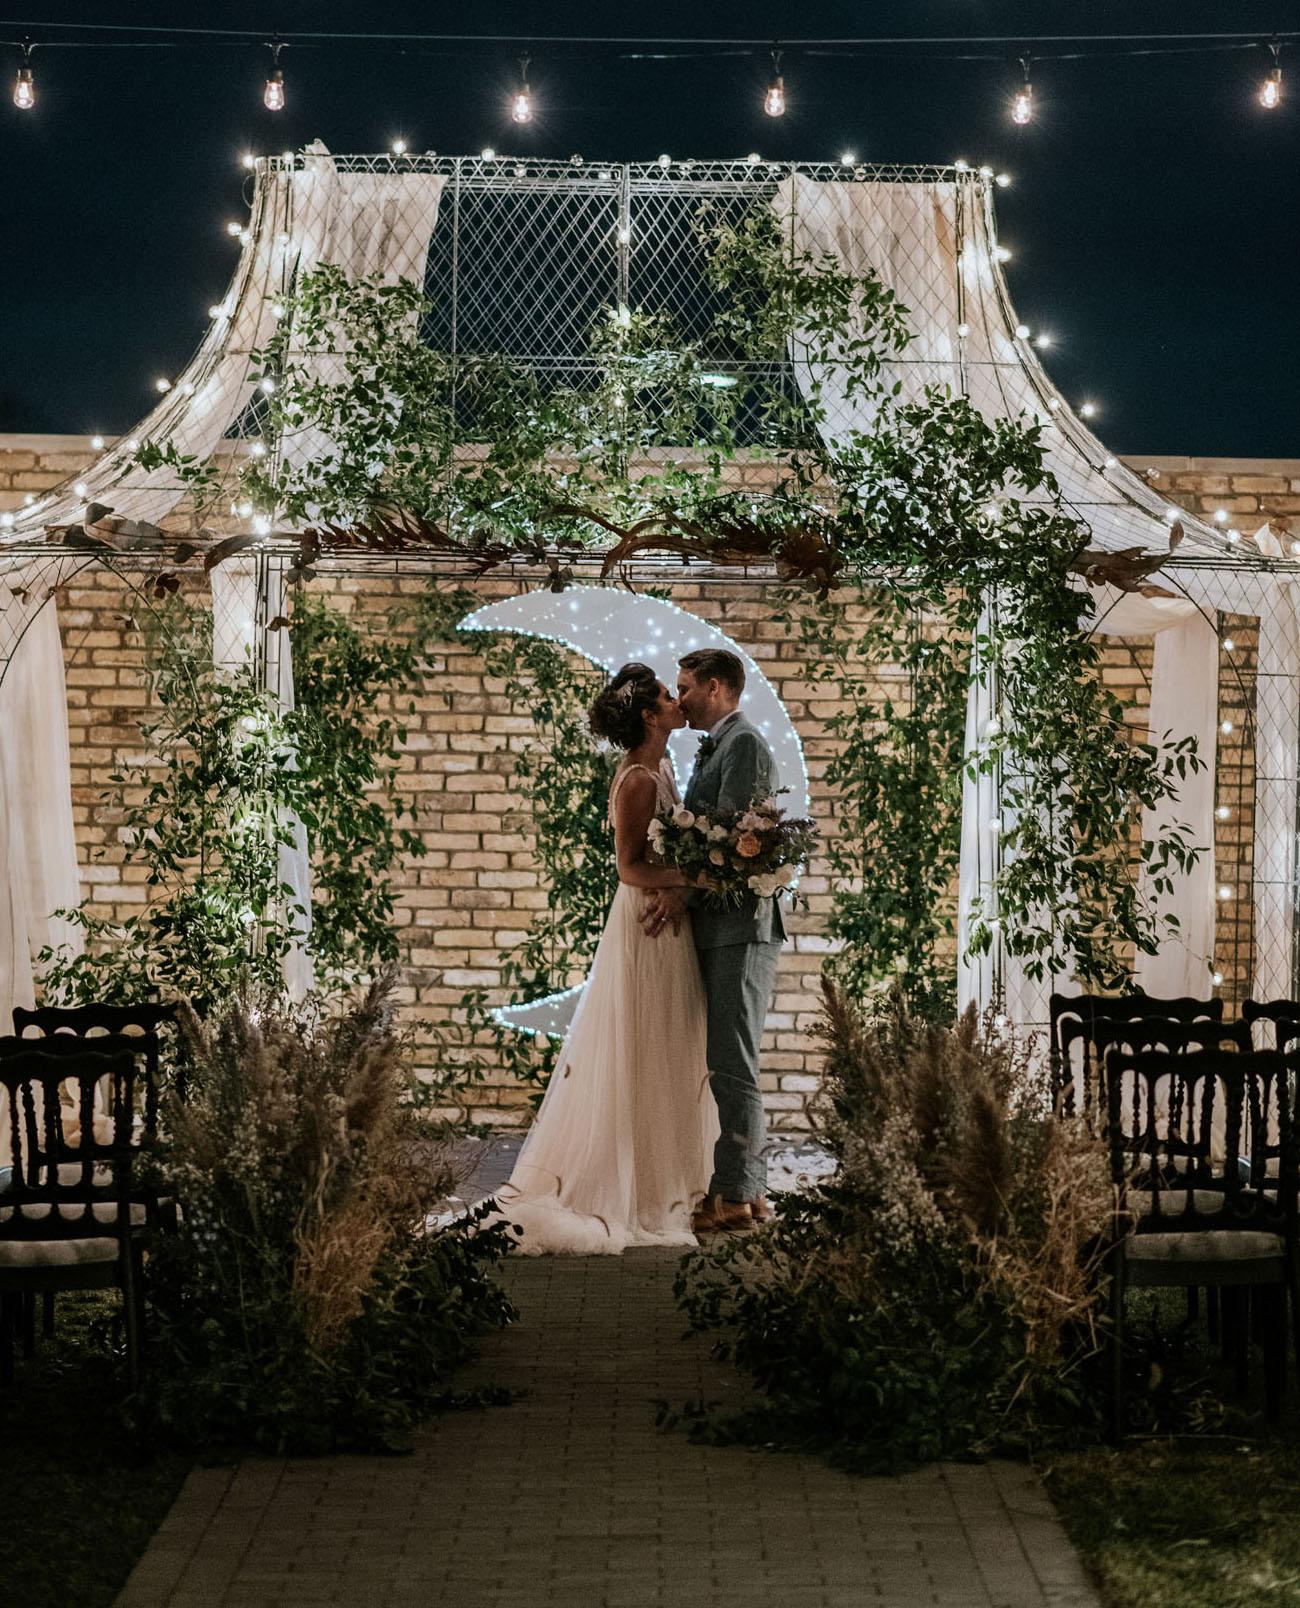 Celestial Wedding Inspiration at Terrain